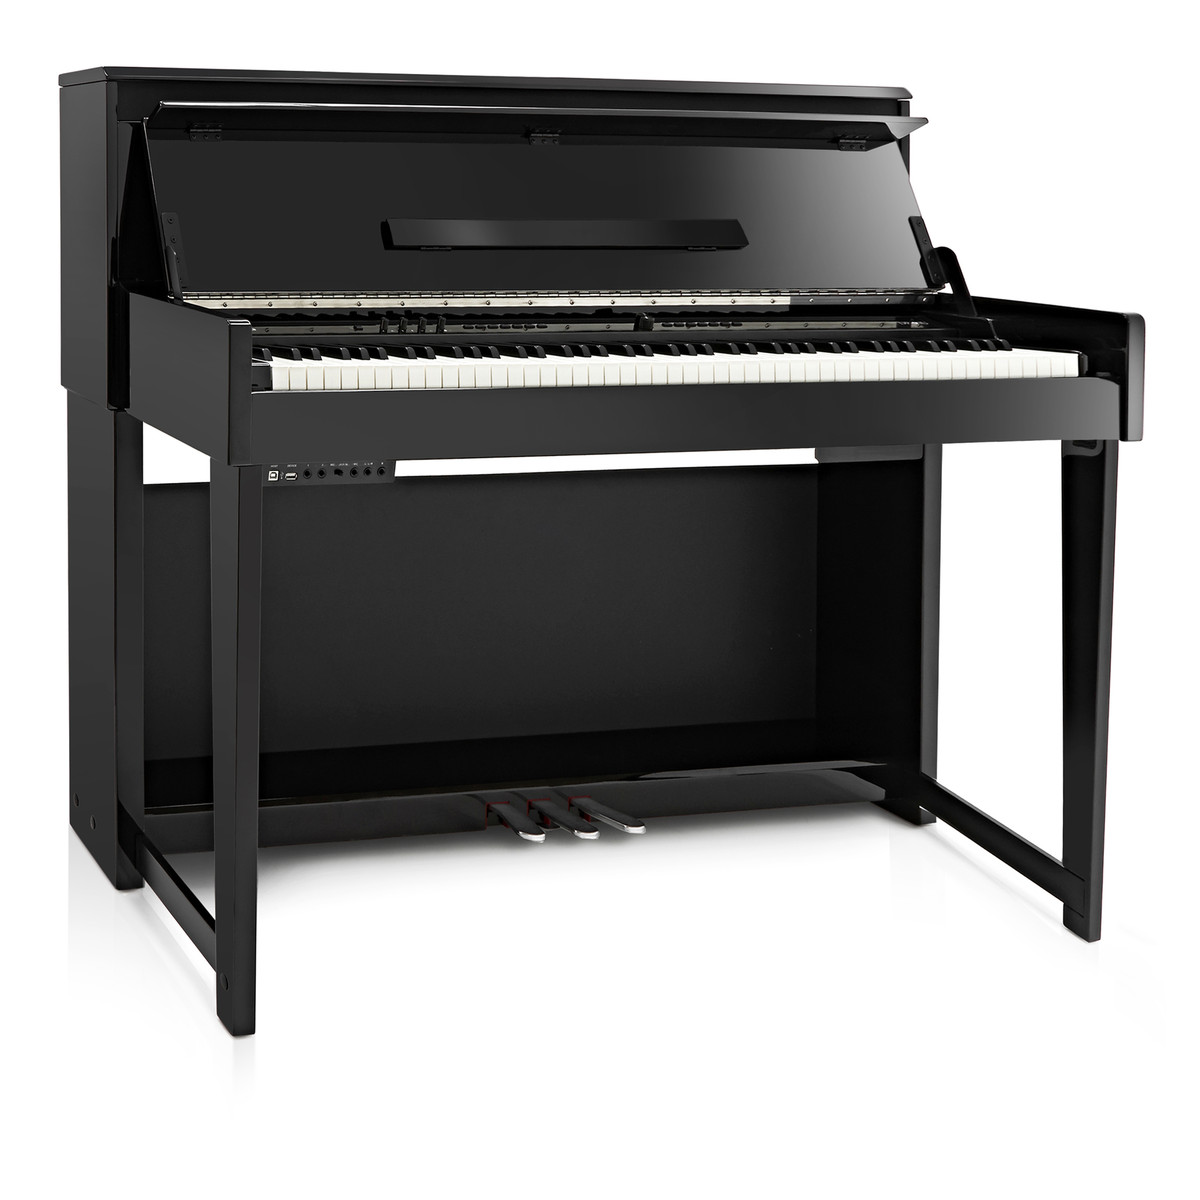 Image of DP-90U Upright Digital Piano by Gear4music